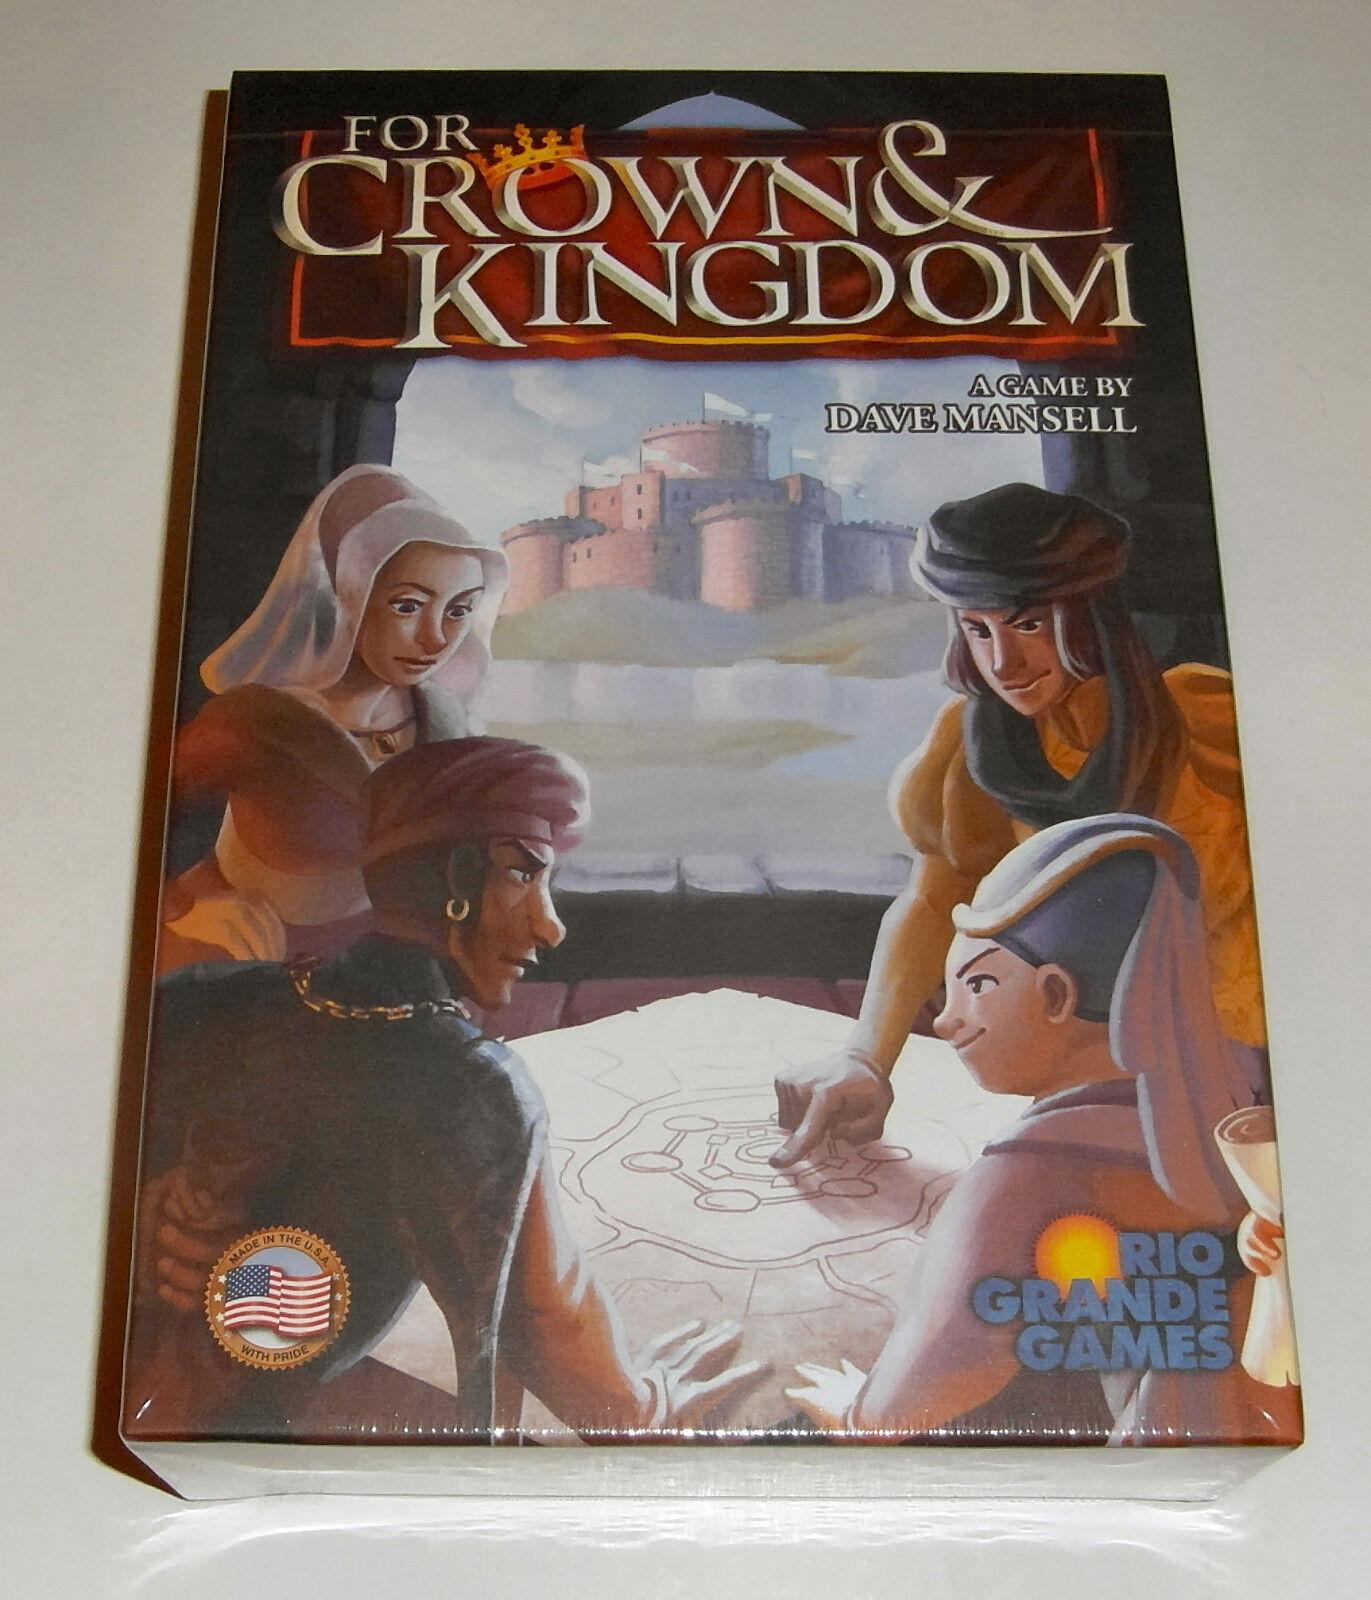 For Crown and Kingdom - Rio Grande Games - 2016